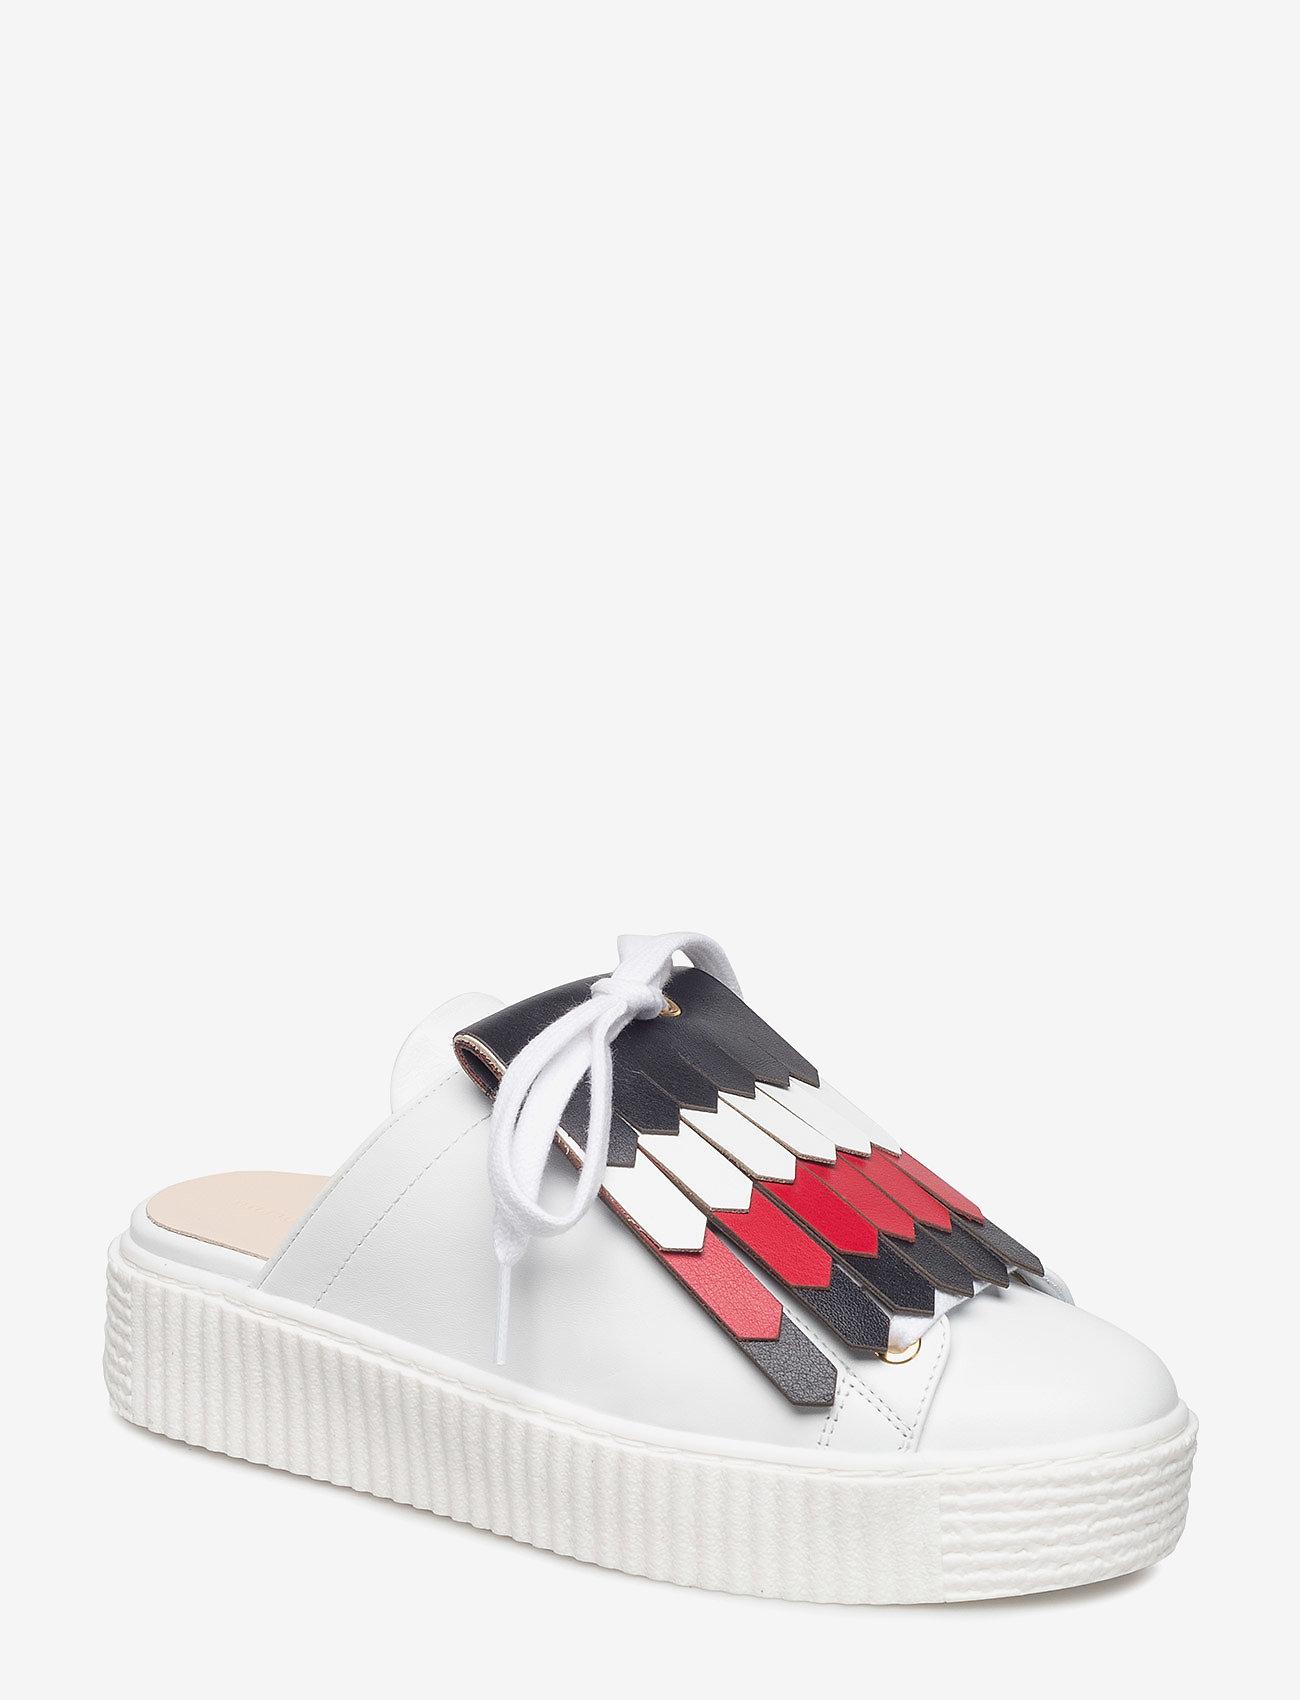 Tommy Hilfiger - CORPORATE SLIP-ON SNEAKER - slip-on sneakers - snow white - 0